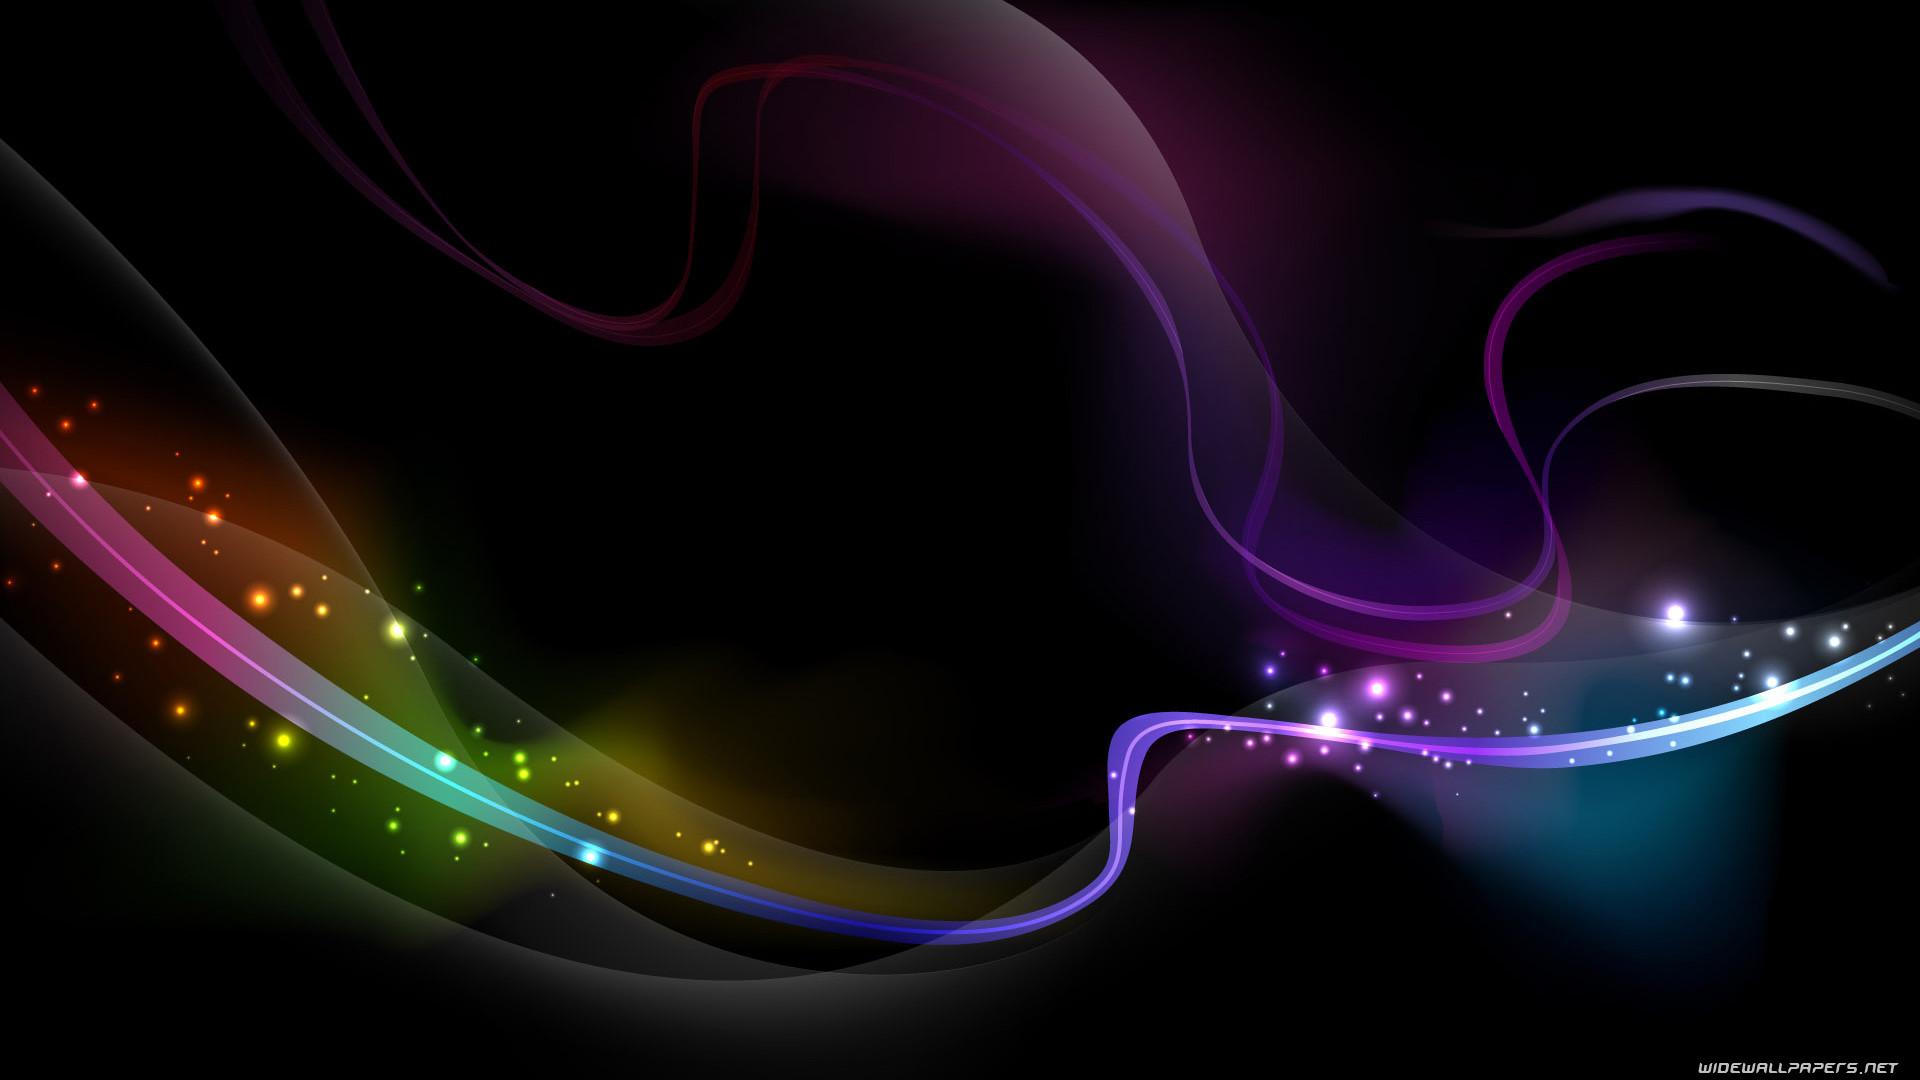 Abstract dark desktop background wallpaper